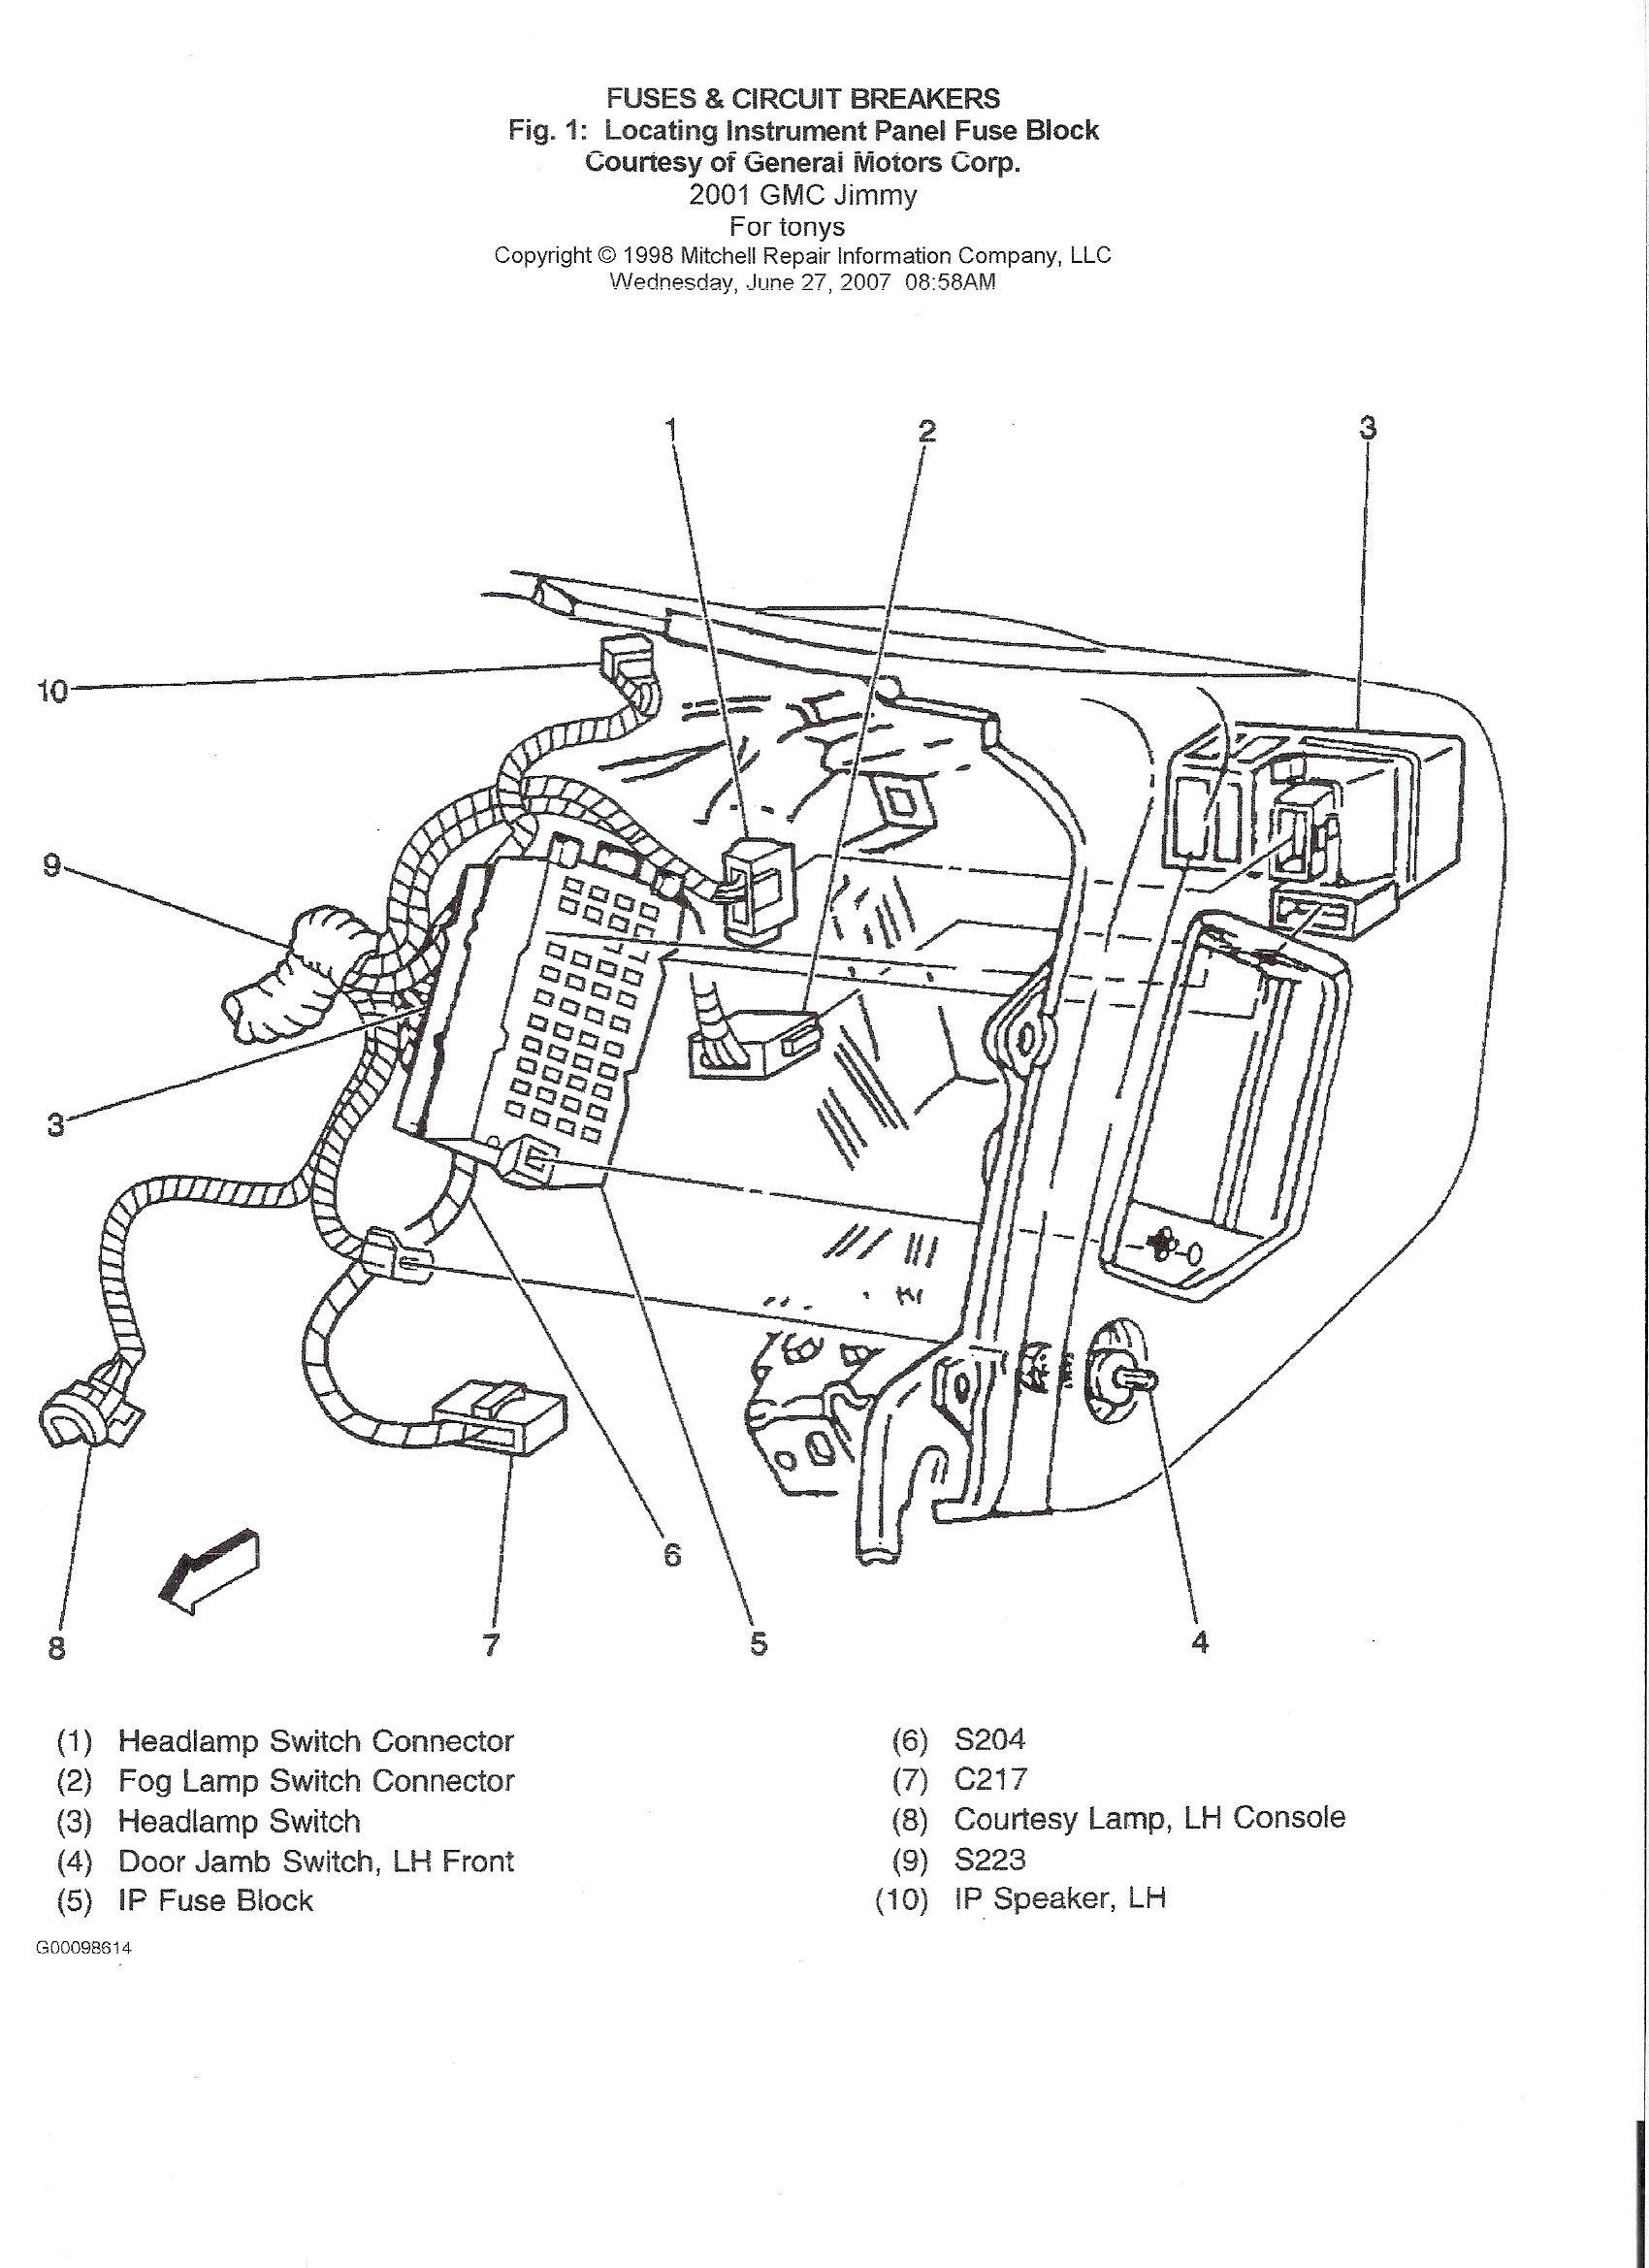 [DIAGRAM_38IU]  Ah 120 Fuse Box Trailer Wiring Diagram 7 Pin Uk -  jibril.kucing-garong-18.sardaracomunitaospitale.it   1984 Bmw 318i Fuse Box Diagram      Wiring Diagram and Schematics